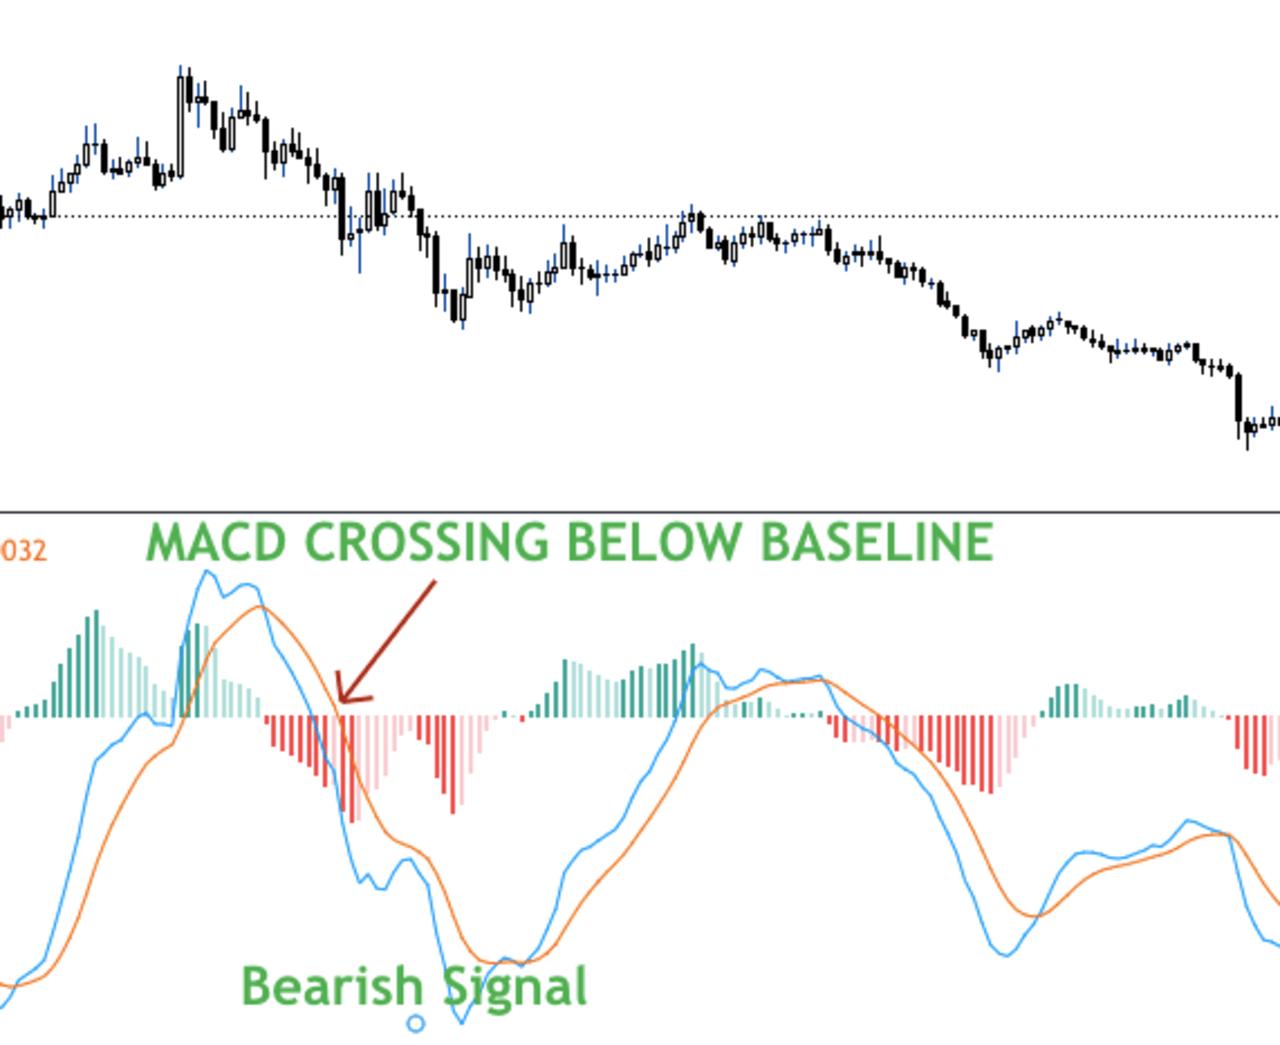 MACD bearish signal